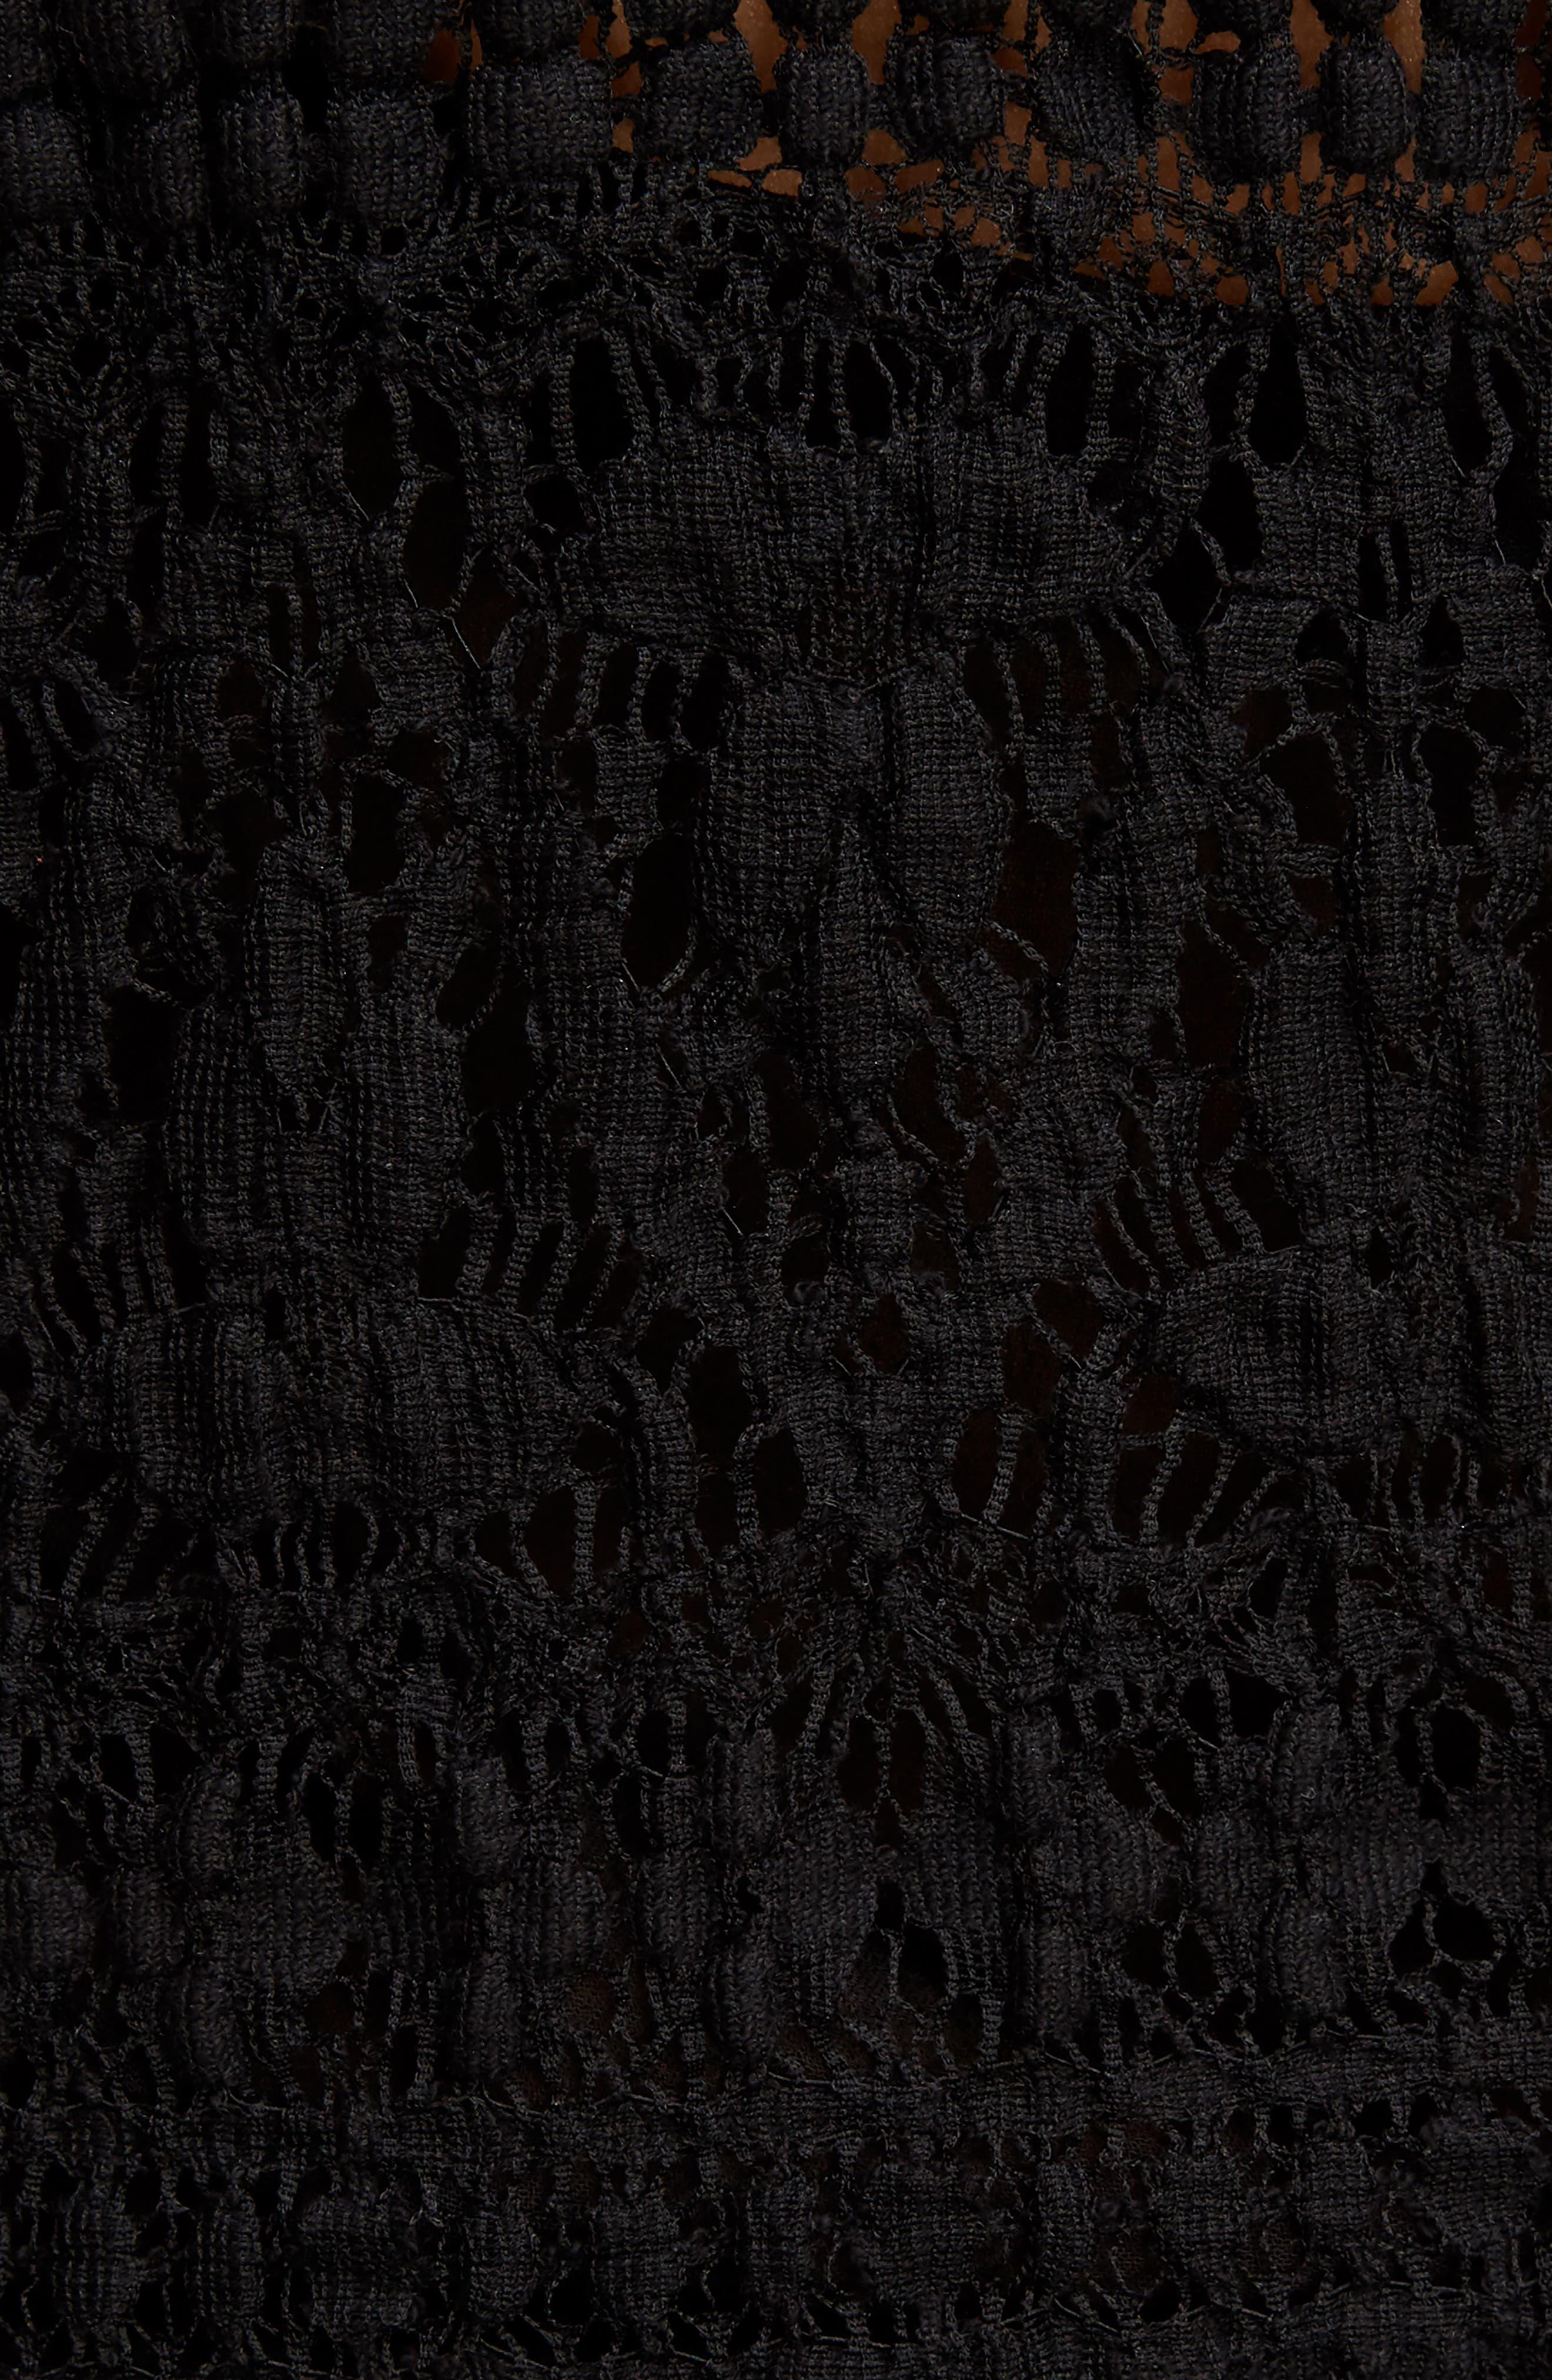 Stretch Lace Top,                             Alternate thumbnail 5, color,                             Black